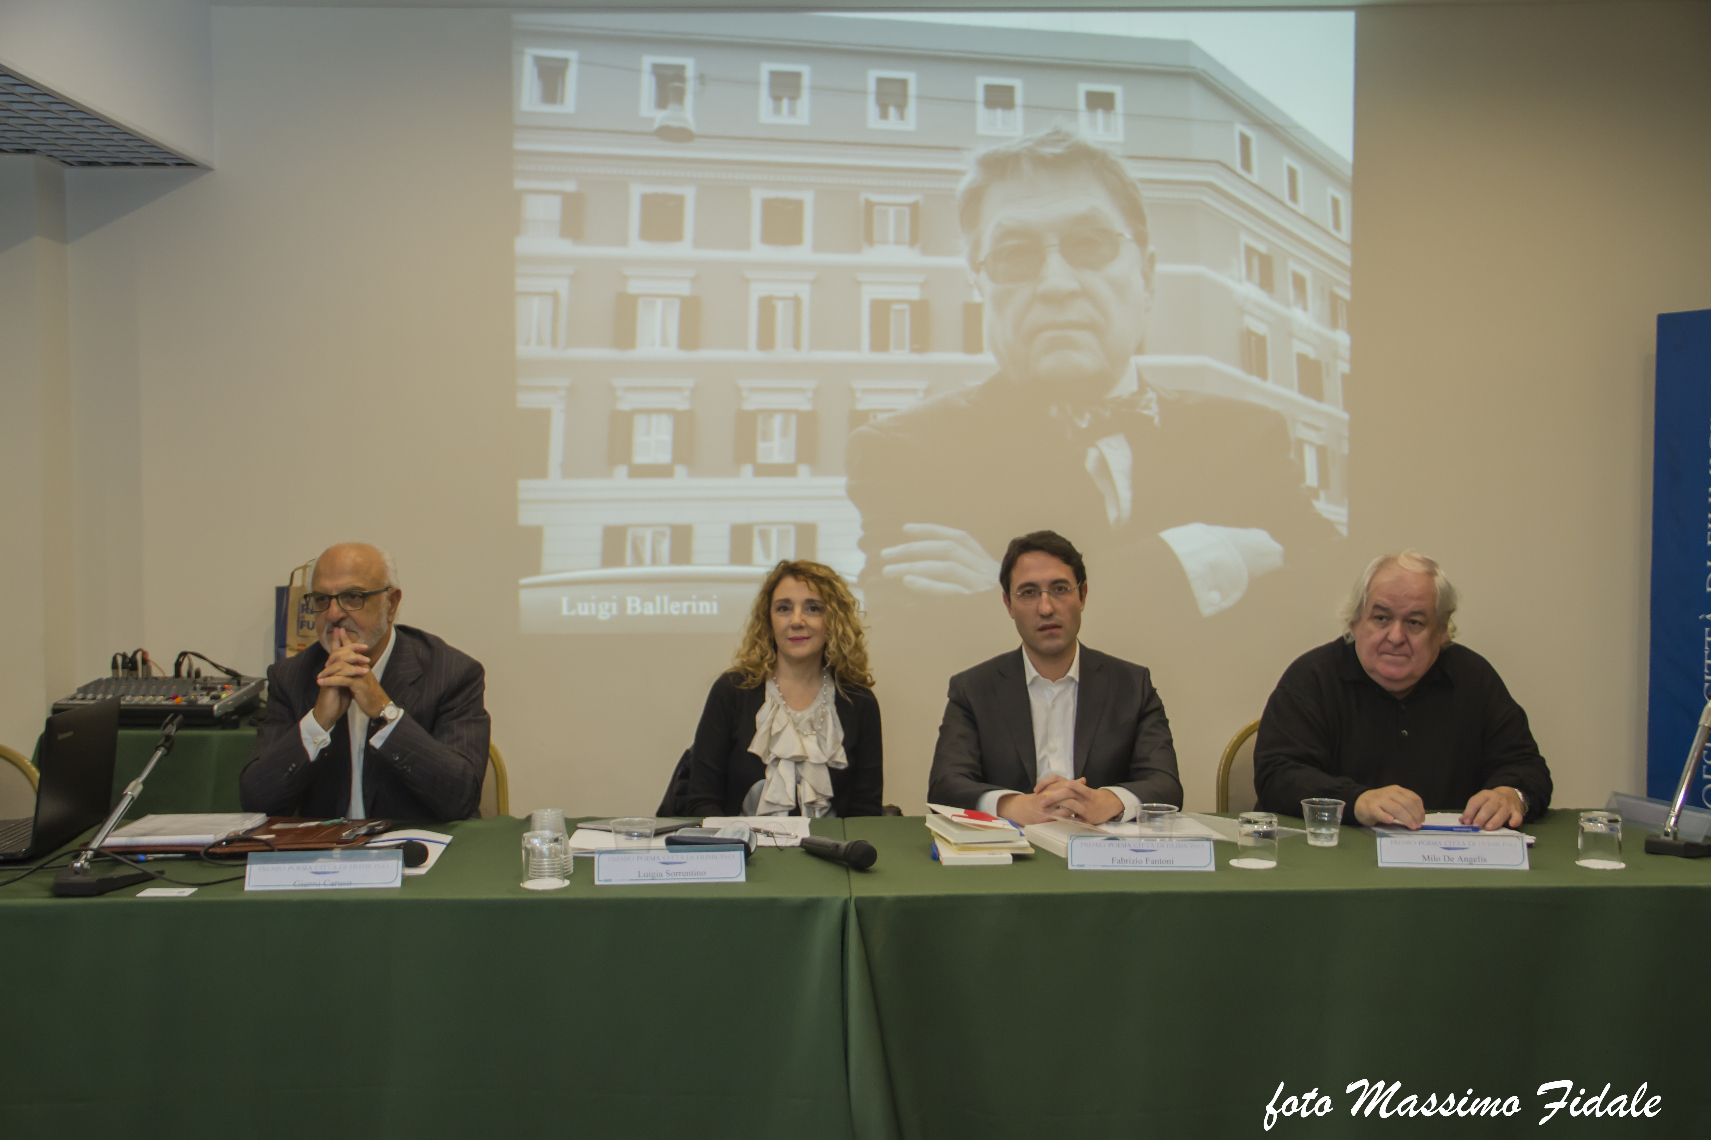 La Giuria tecnicaCaruso, De Angelis, Fantoni, Sorrentino